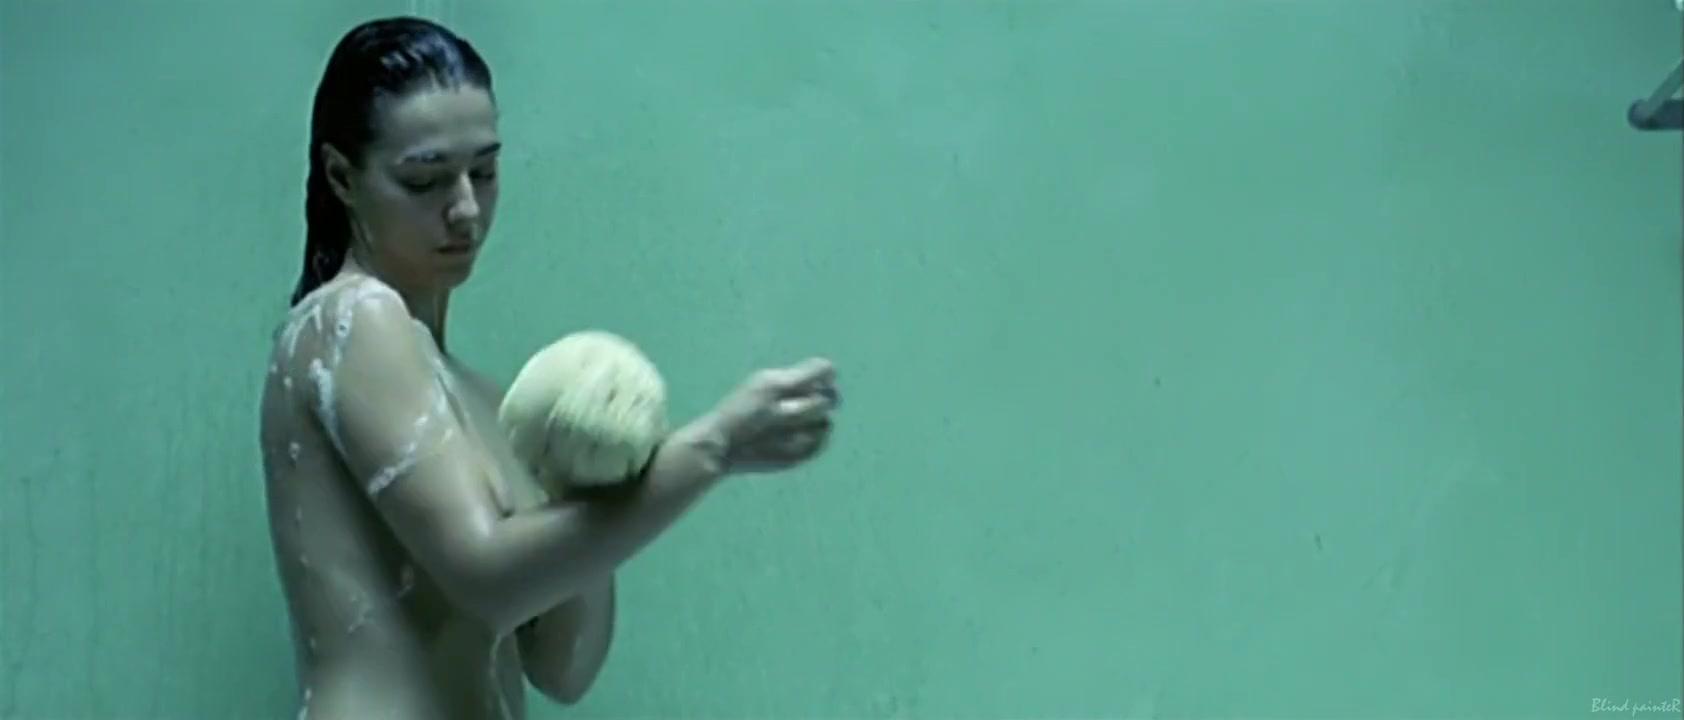 Hipnos (2004) Cristina Brondo, Marisol Membrillo Mature orgasm x hamster